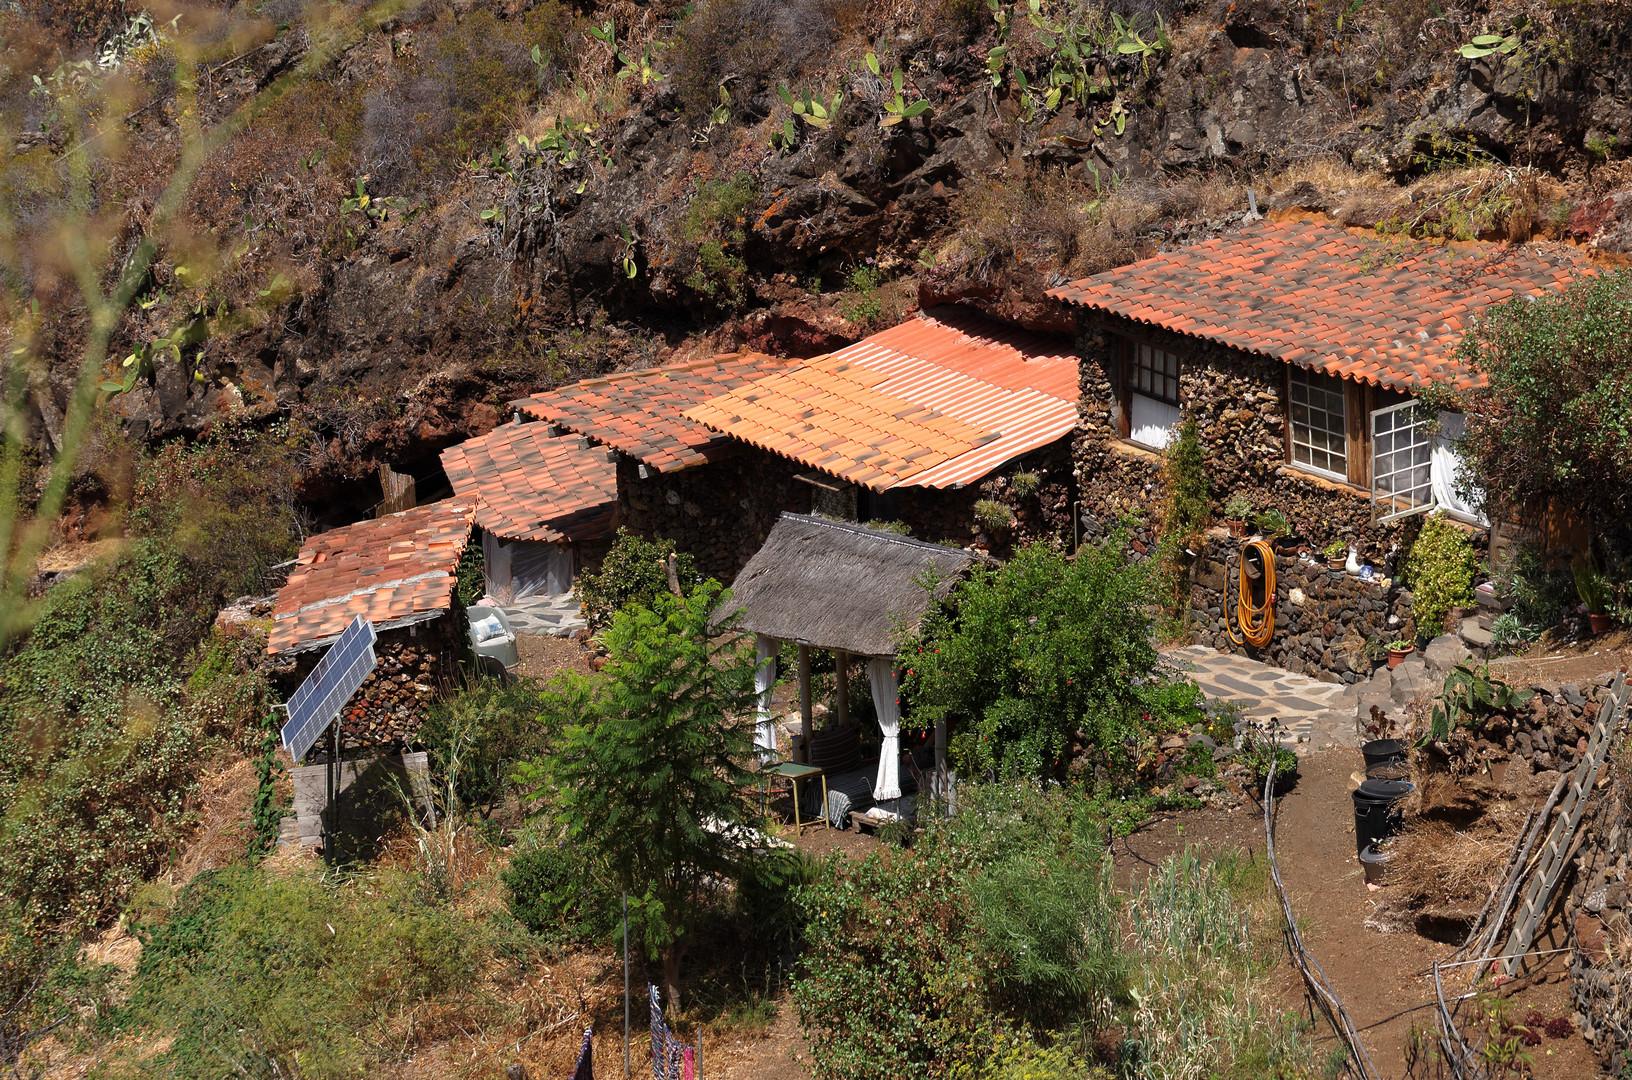 Urige Hütten bei Las Tricias, La Palma, September 2013